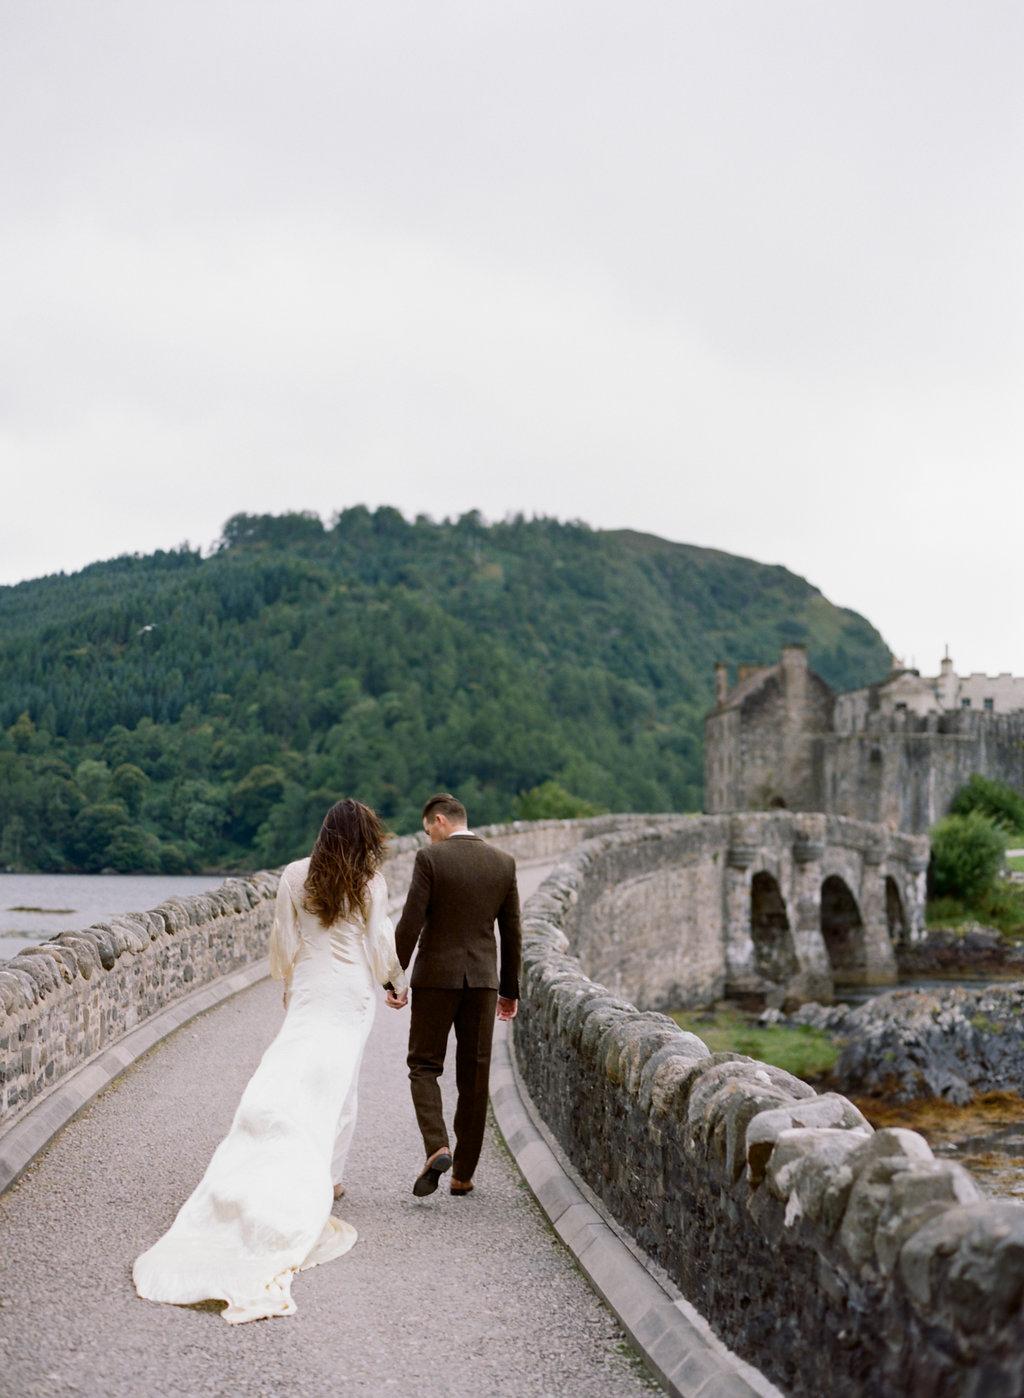 Scotland-Prewedding-highlands-castle-Engagment-Photos-Katie-Grant (134 of 139).jpg